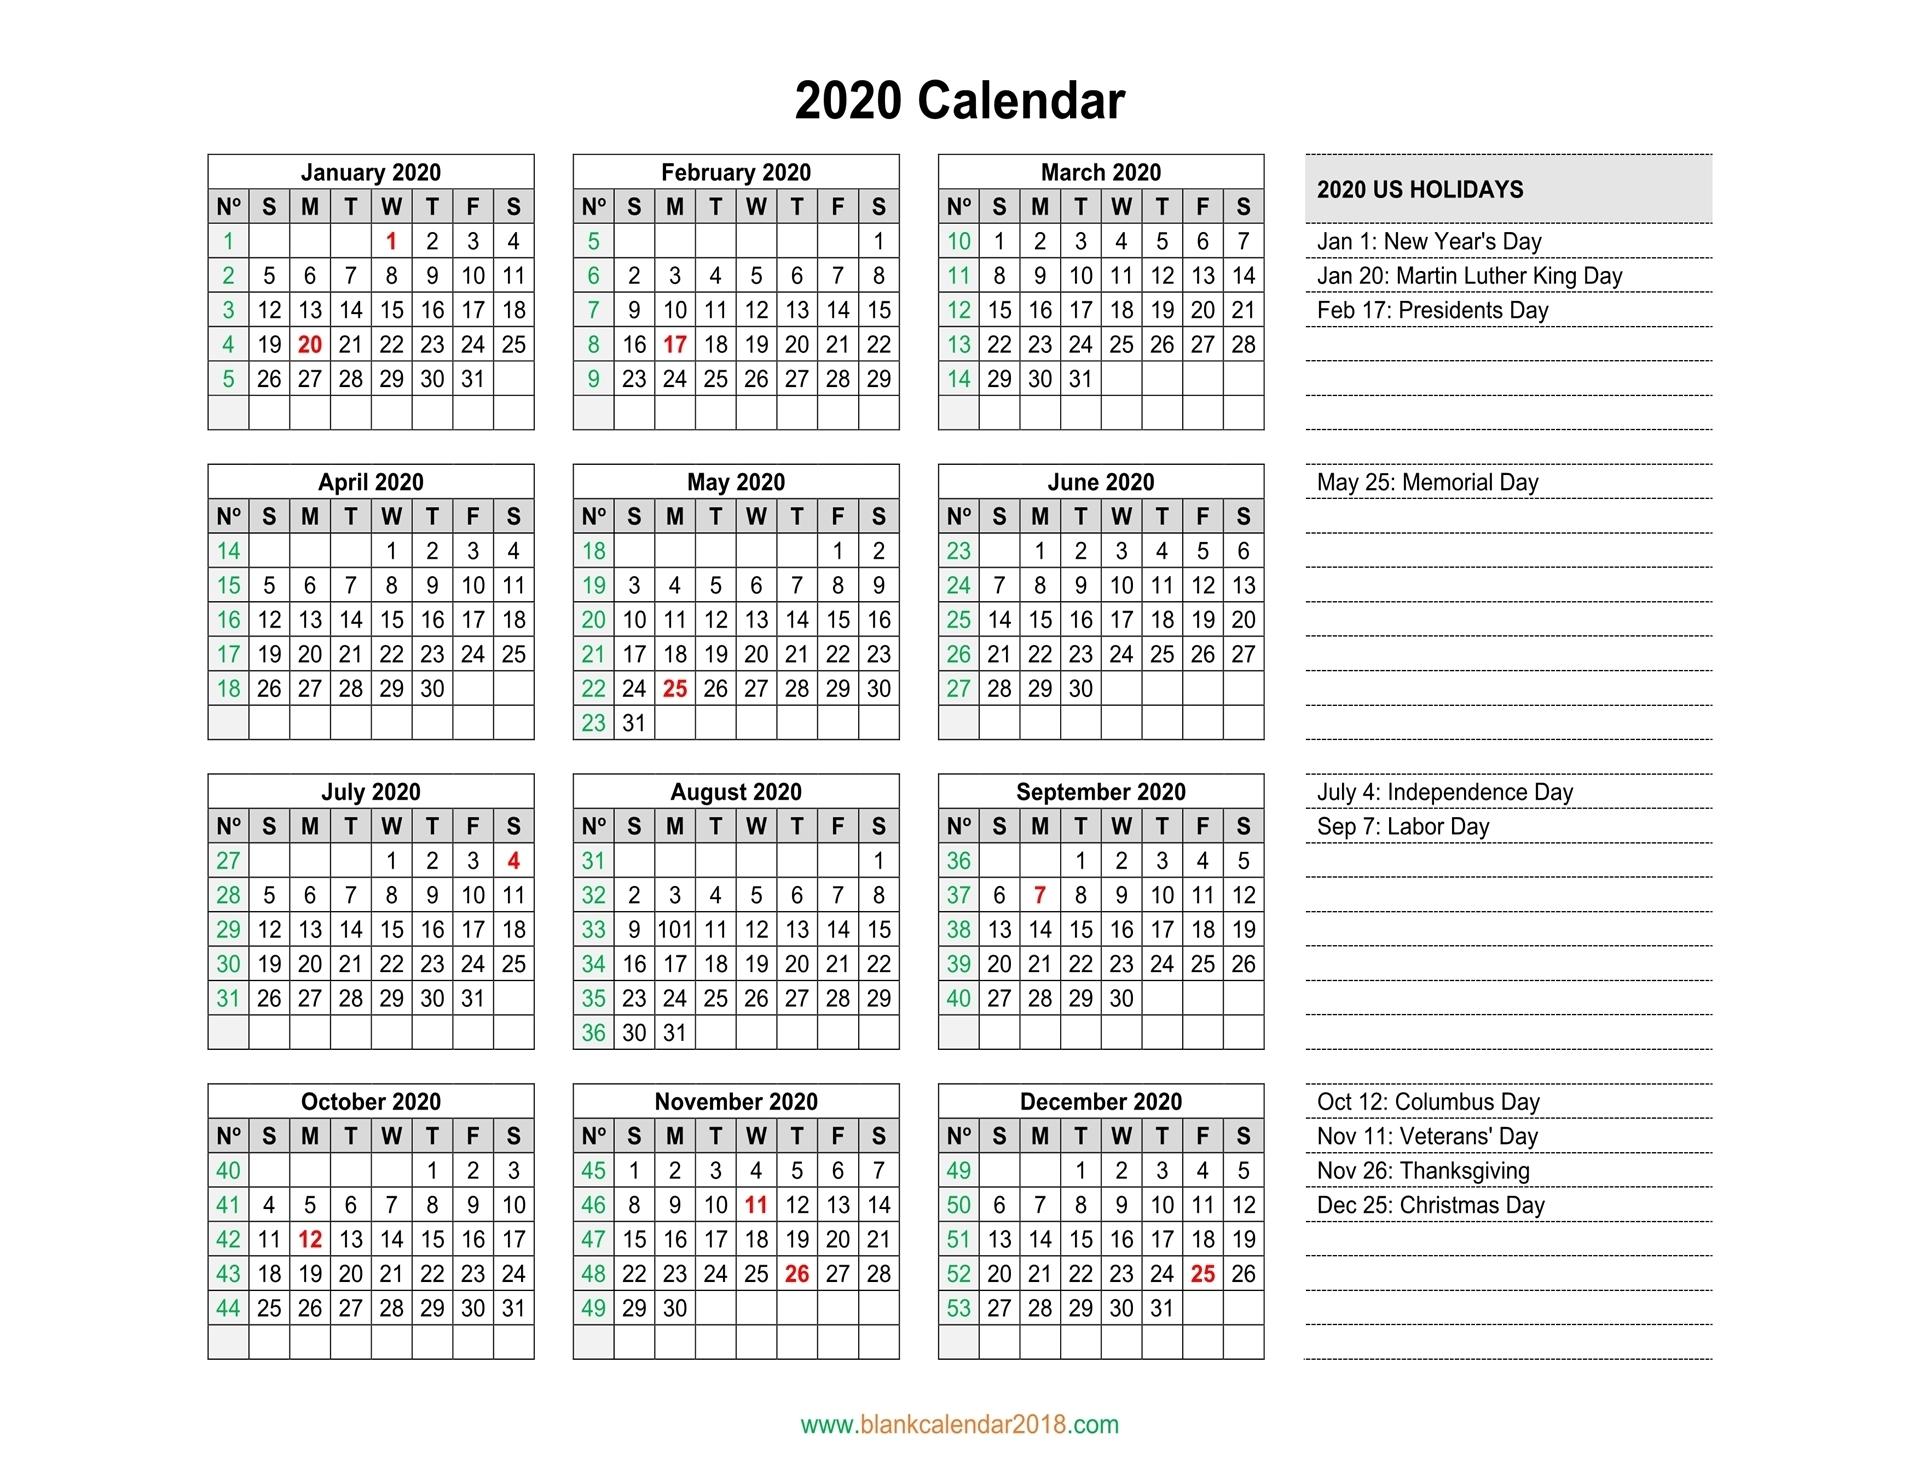 Blank Calendar 2020 inside 2019 2020 Calendar Space To Write